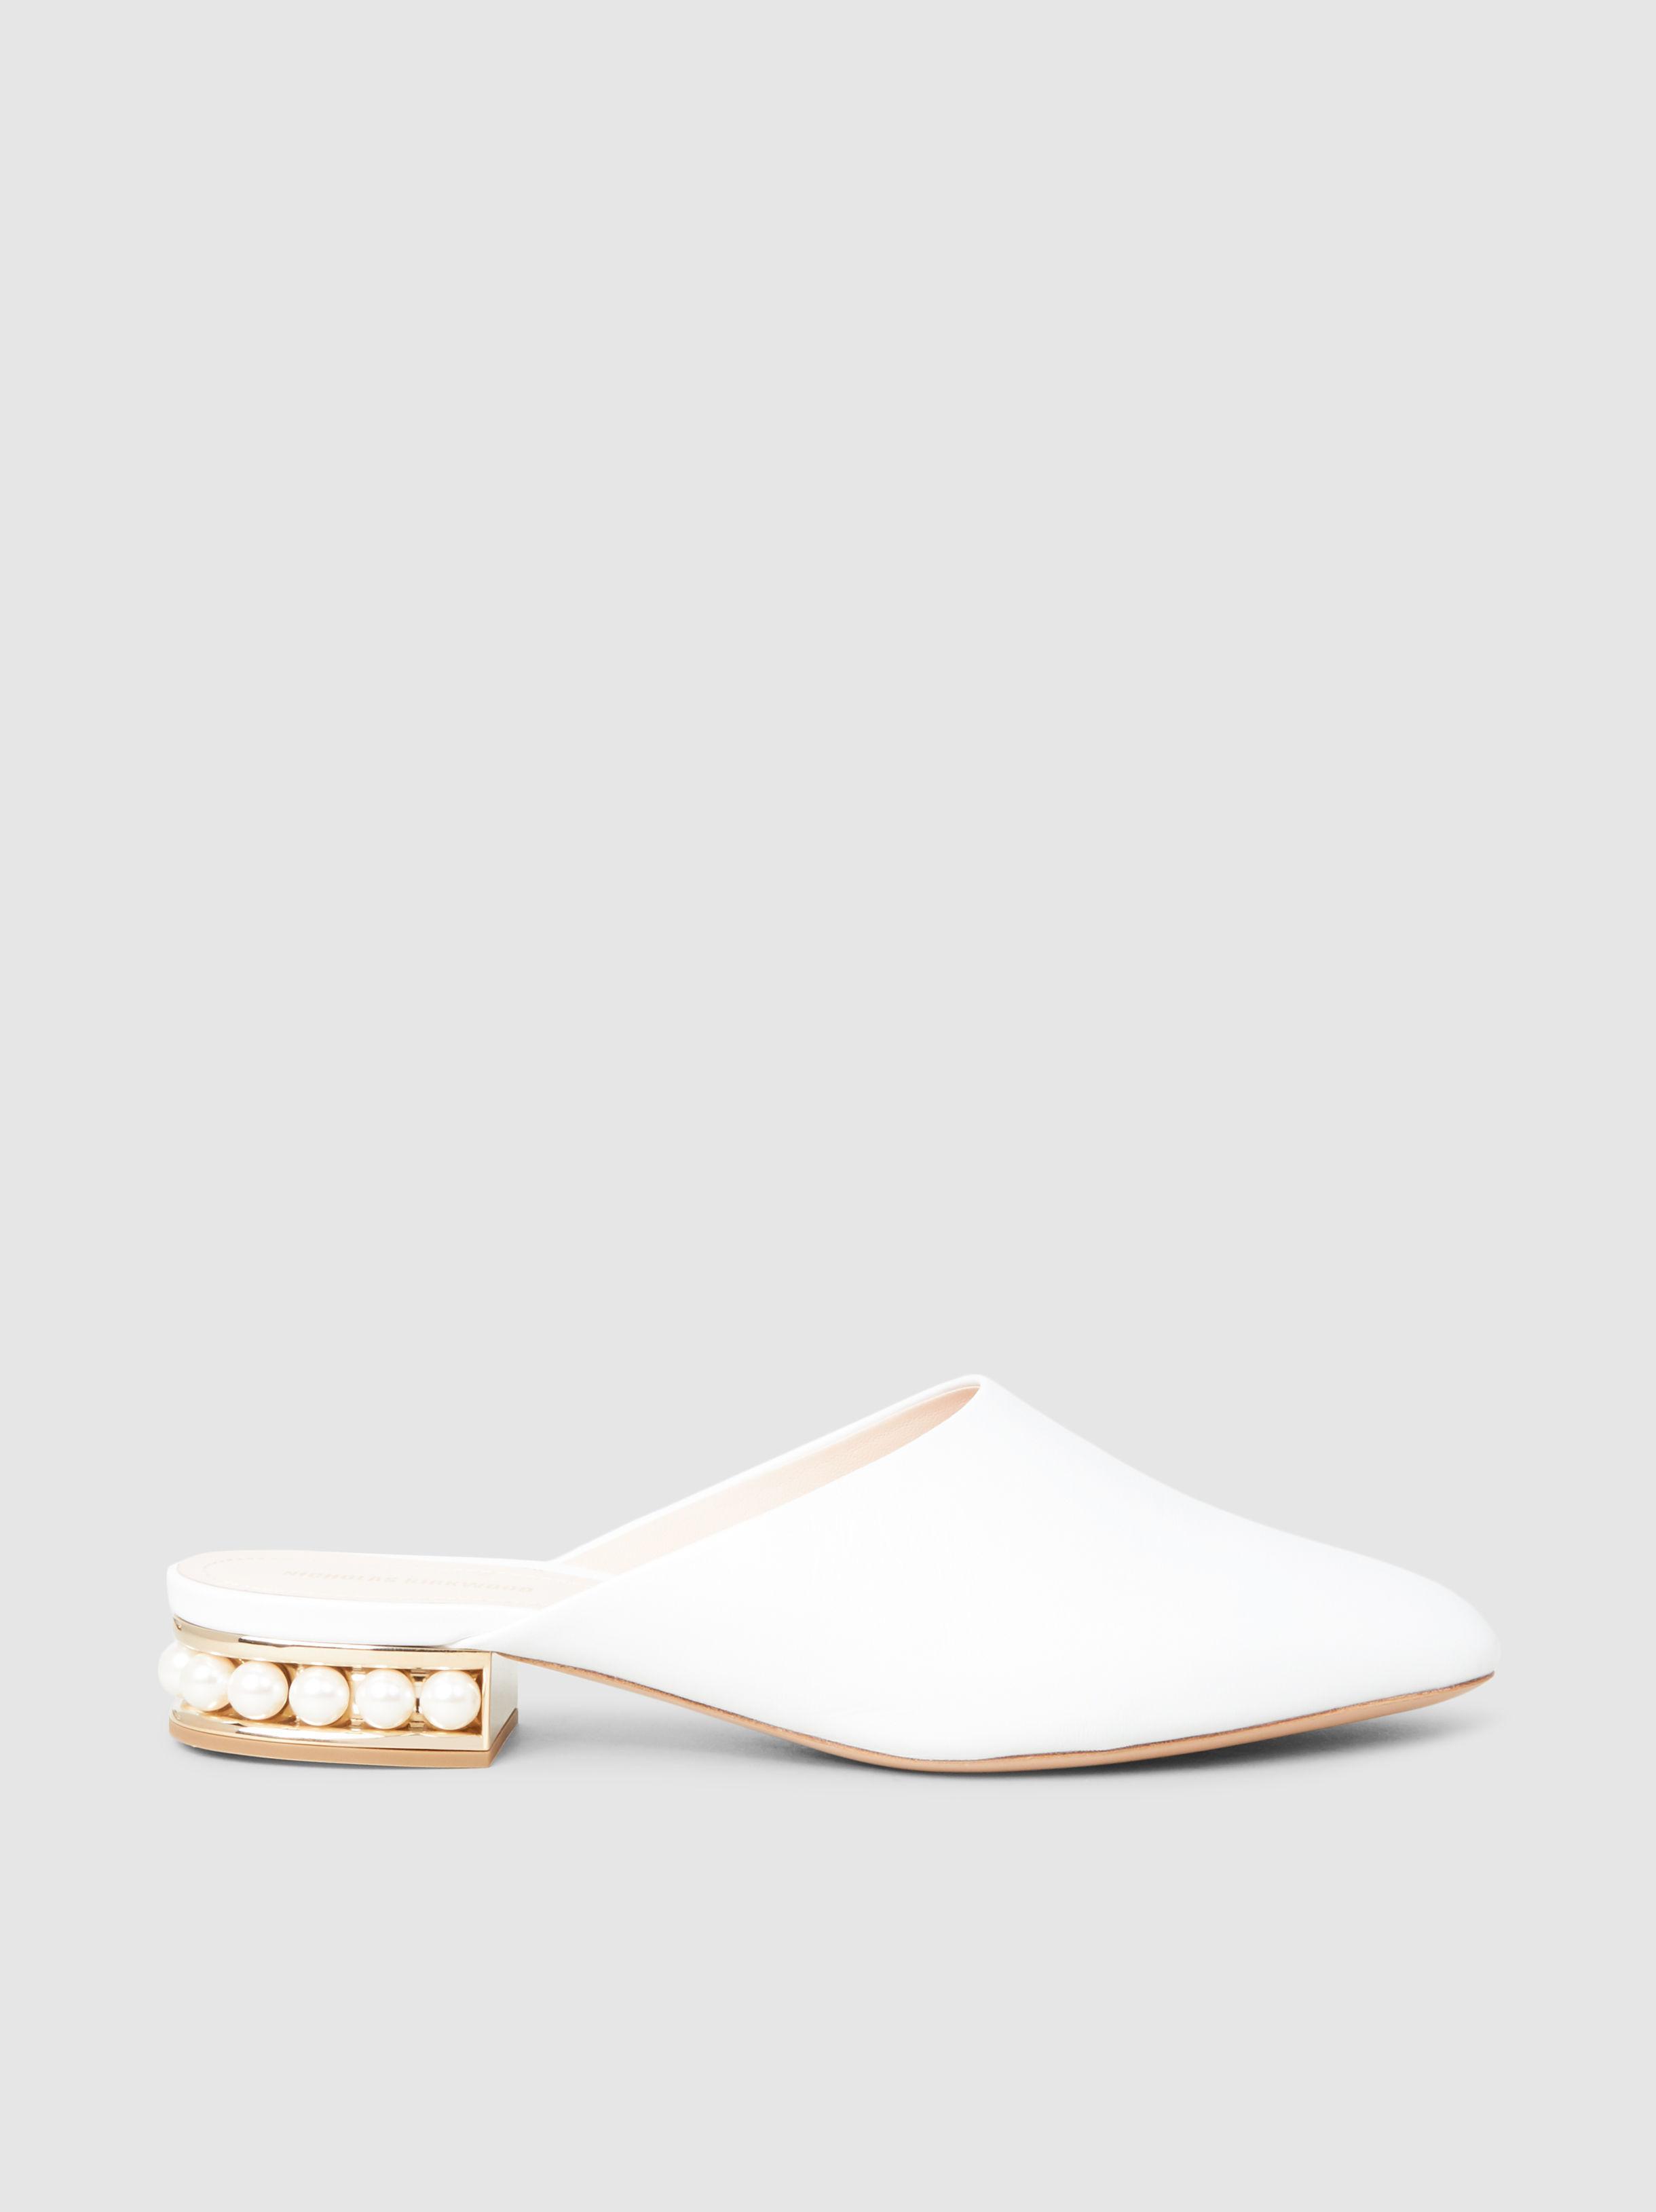 Casati Faux Pearl-Embellished Leather Slippers Nicholas Kirkwood 0ZTI3vO5